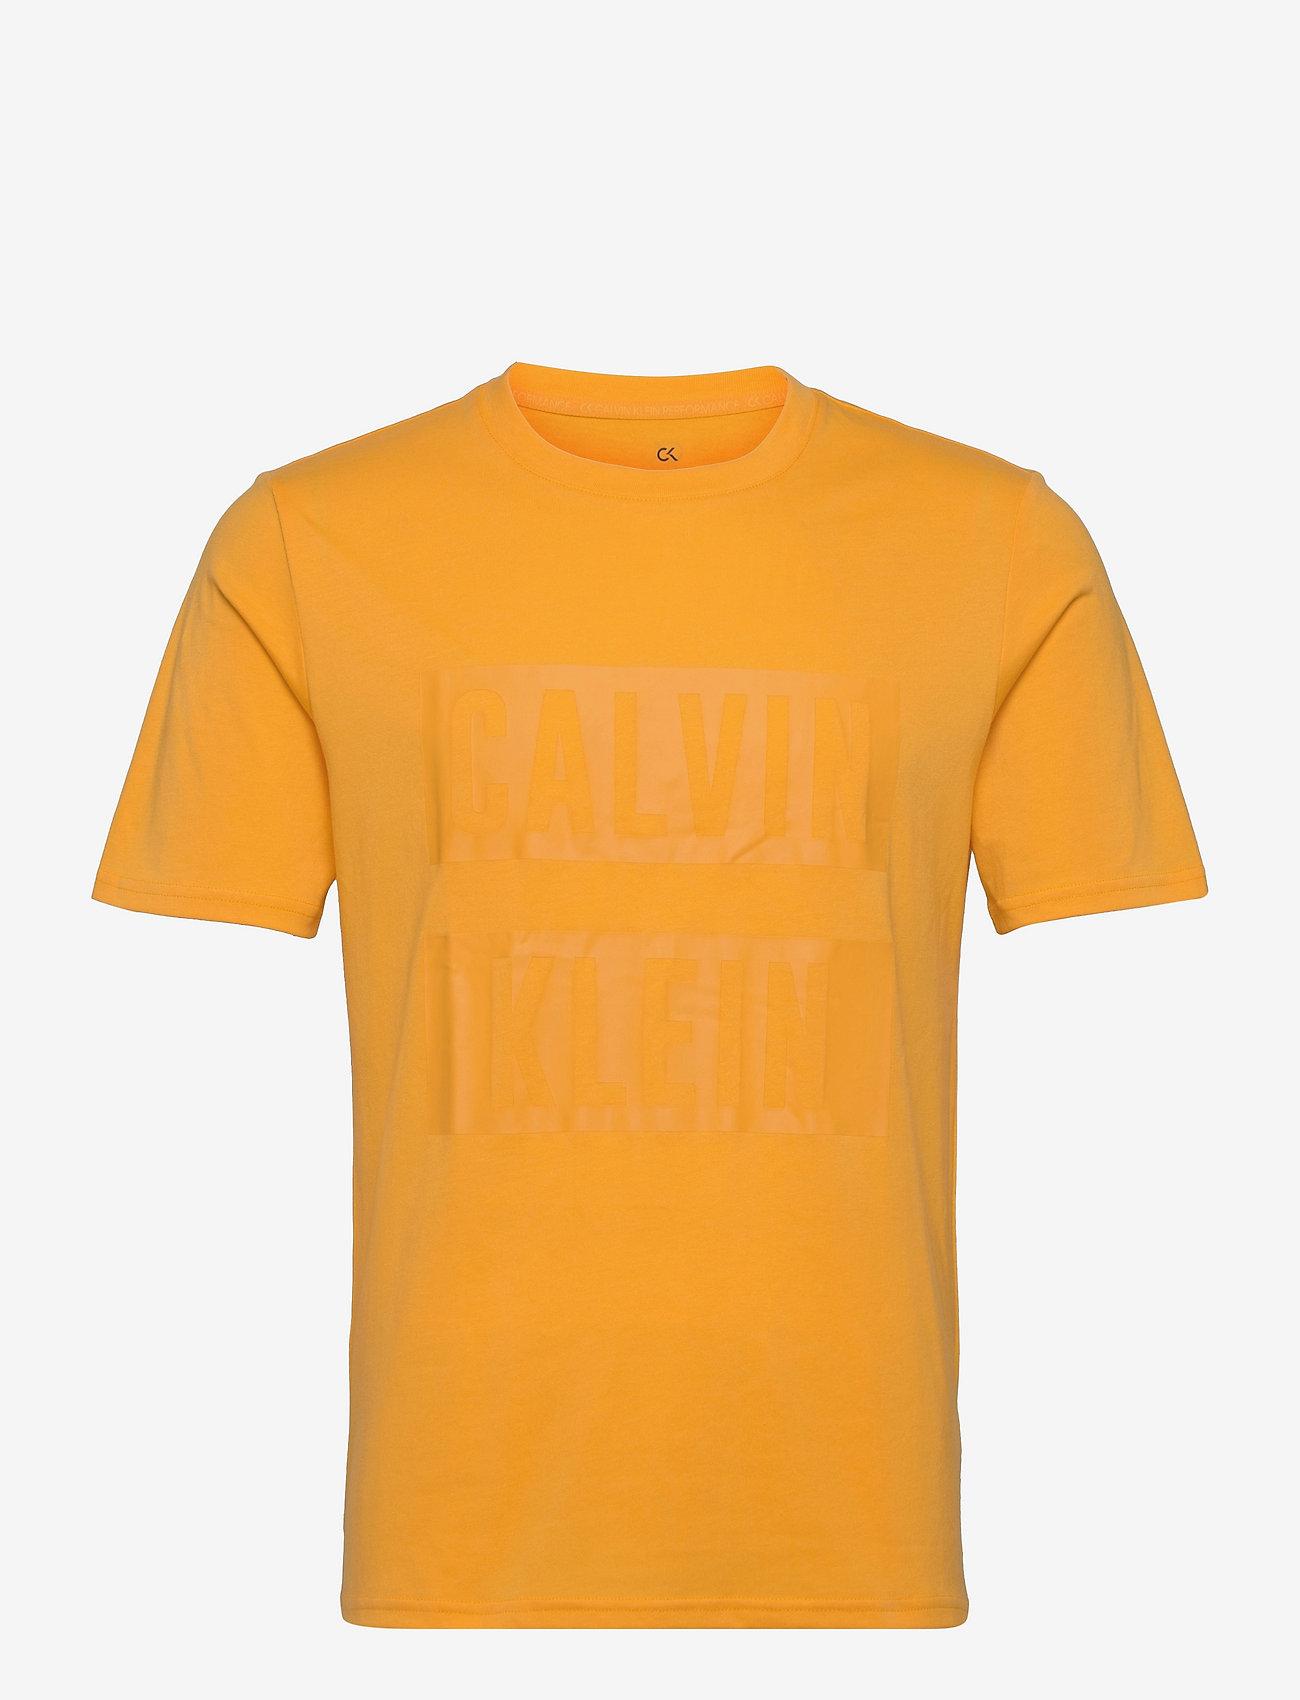 Calvin Klein Performance - PW - S/S T-SHIRT - t-shirts - mellow yellow - 0